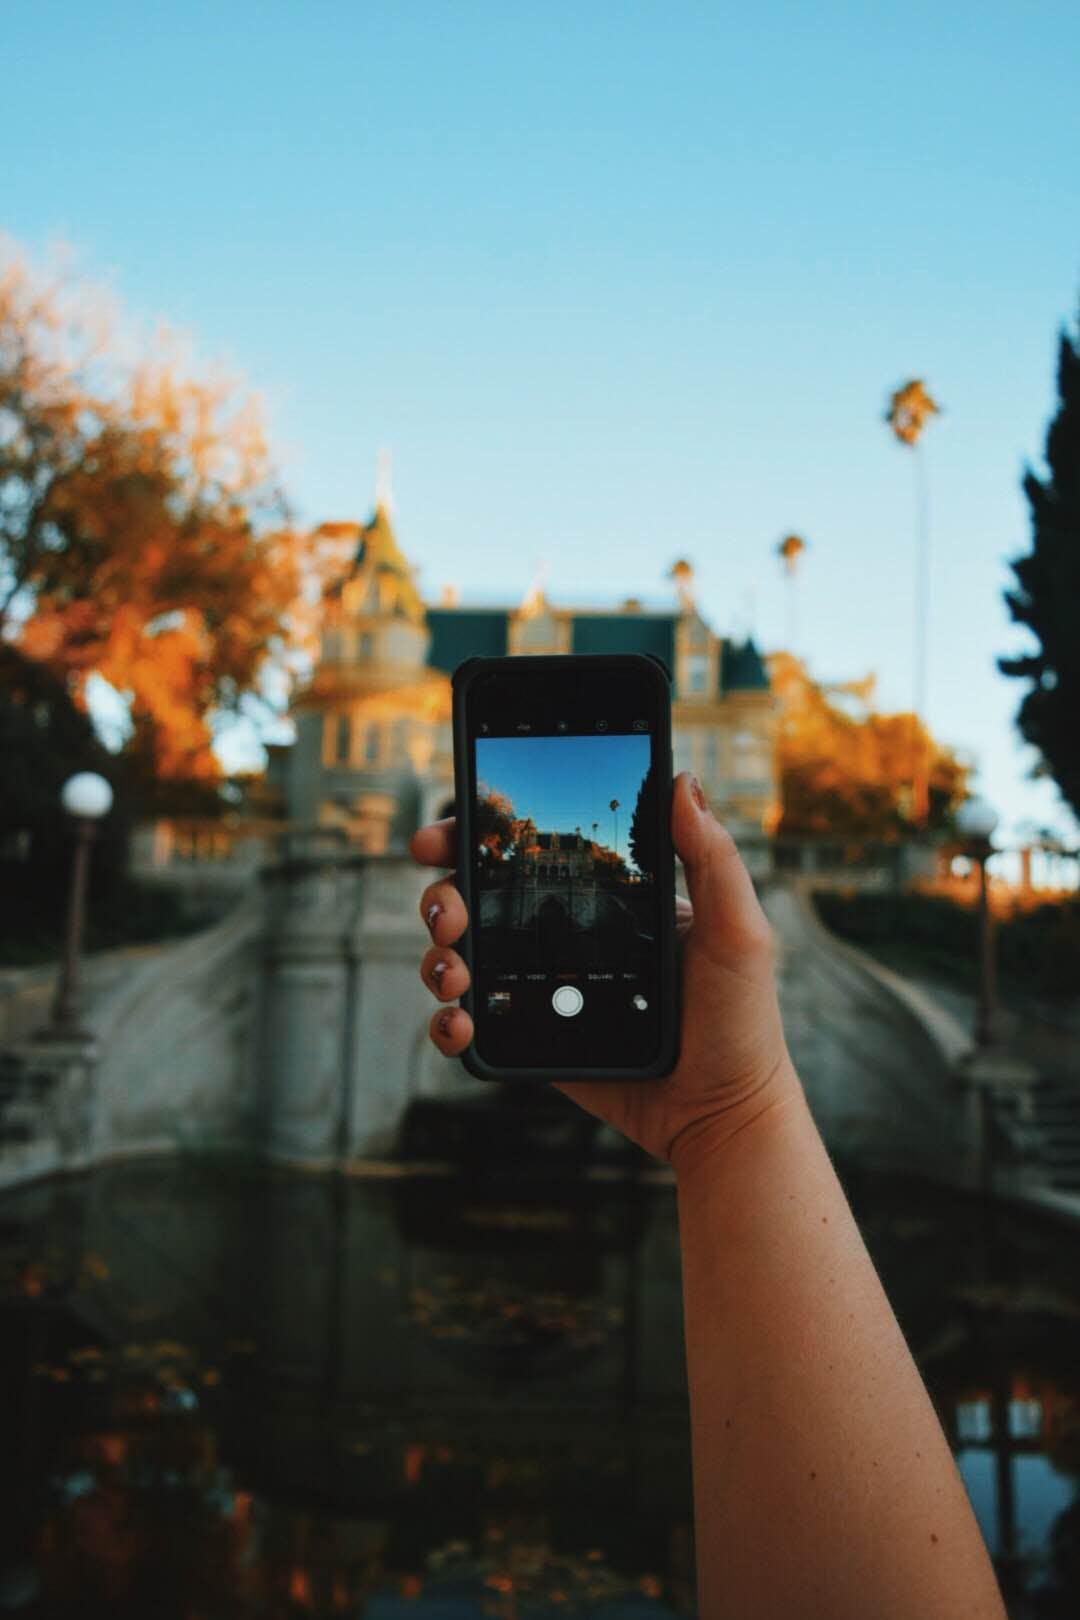 Kostenloses Stock Foto zu apfel, foto machen, hand, iphone